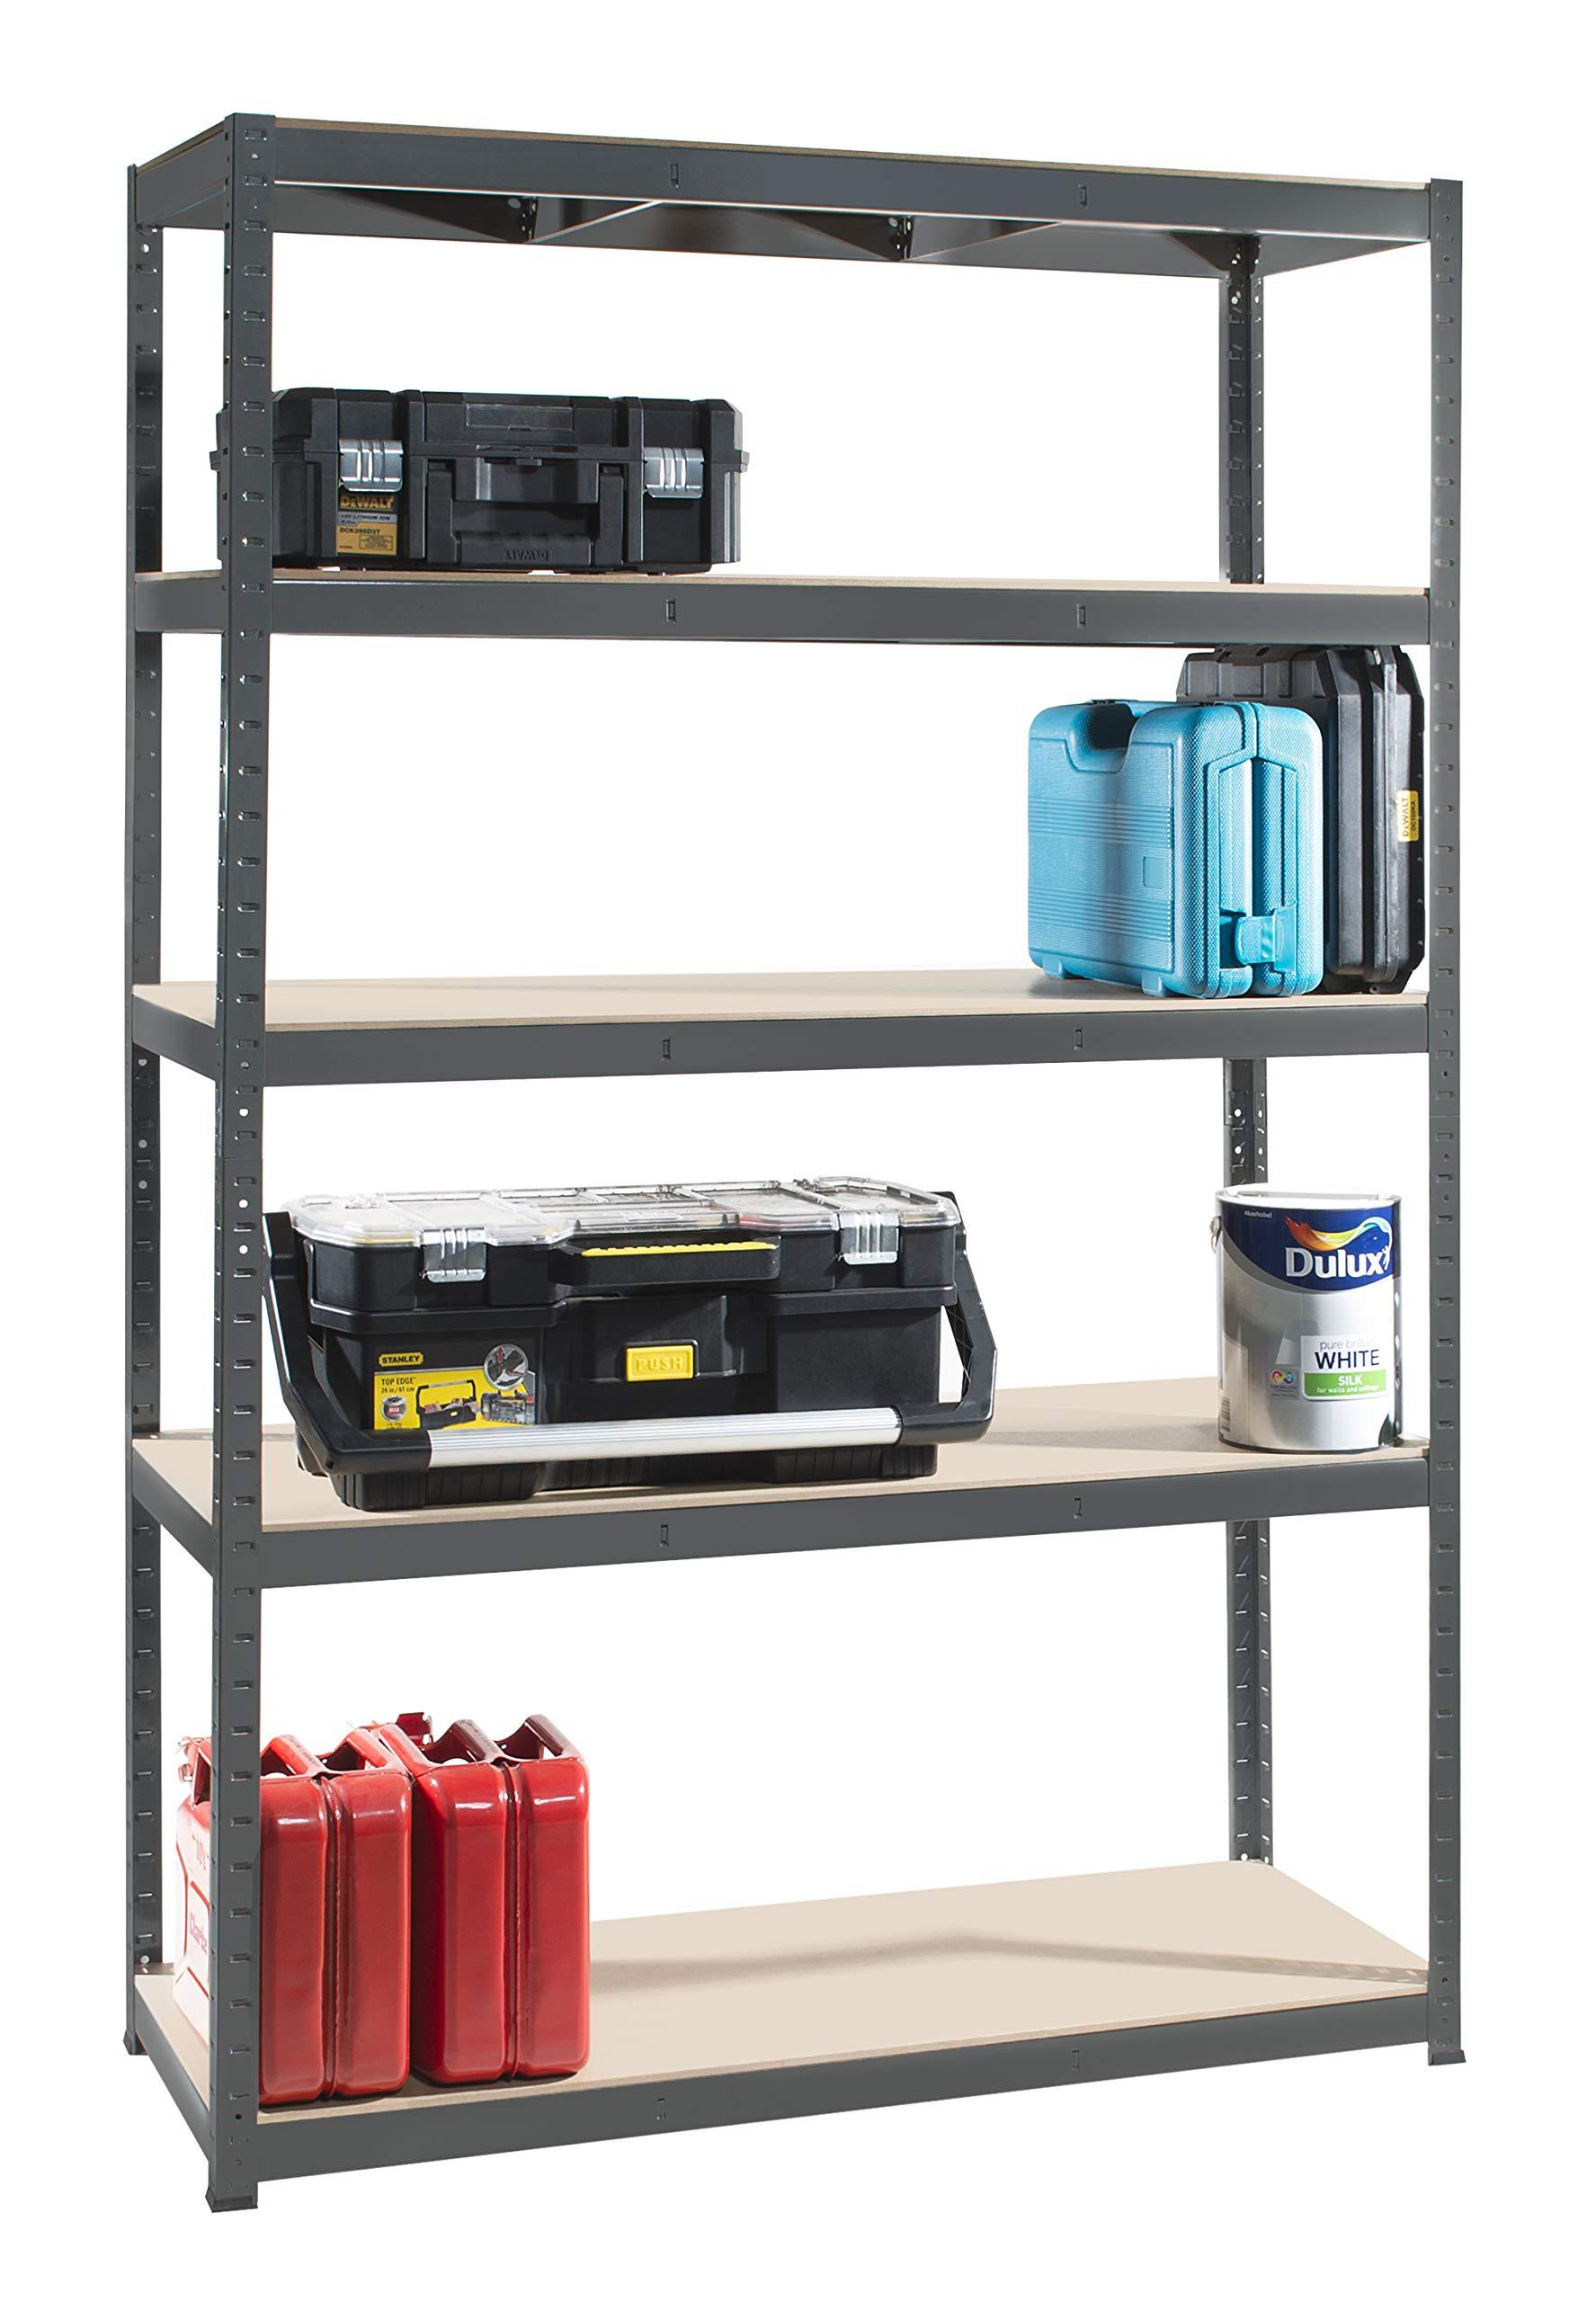 cm 4 Units 5 Tiers 176 High x 90 Wide x 60 Deep | Grey Storage Shelves 265kg UDL Storage Affairs Heavy Duty Garage Shelving Steel Frame Boltless Assembly Metal Racks